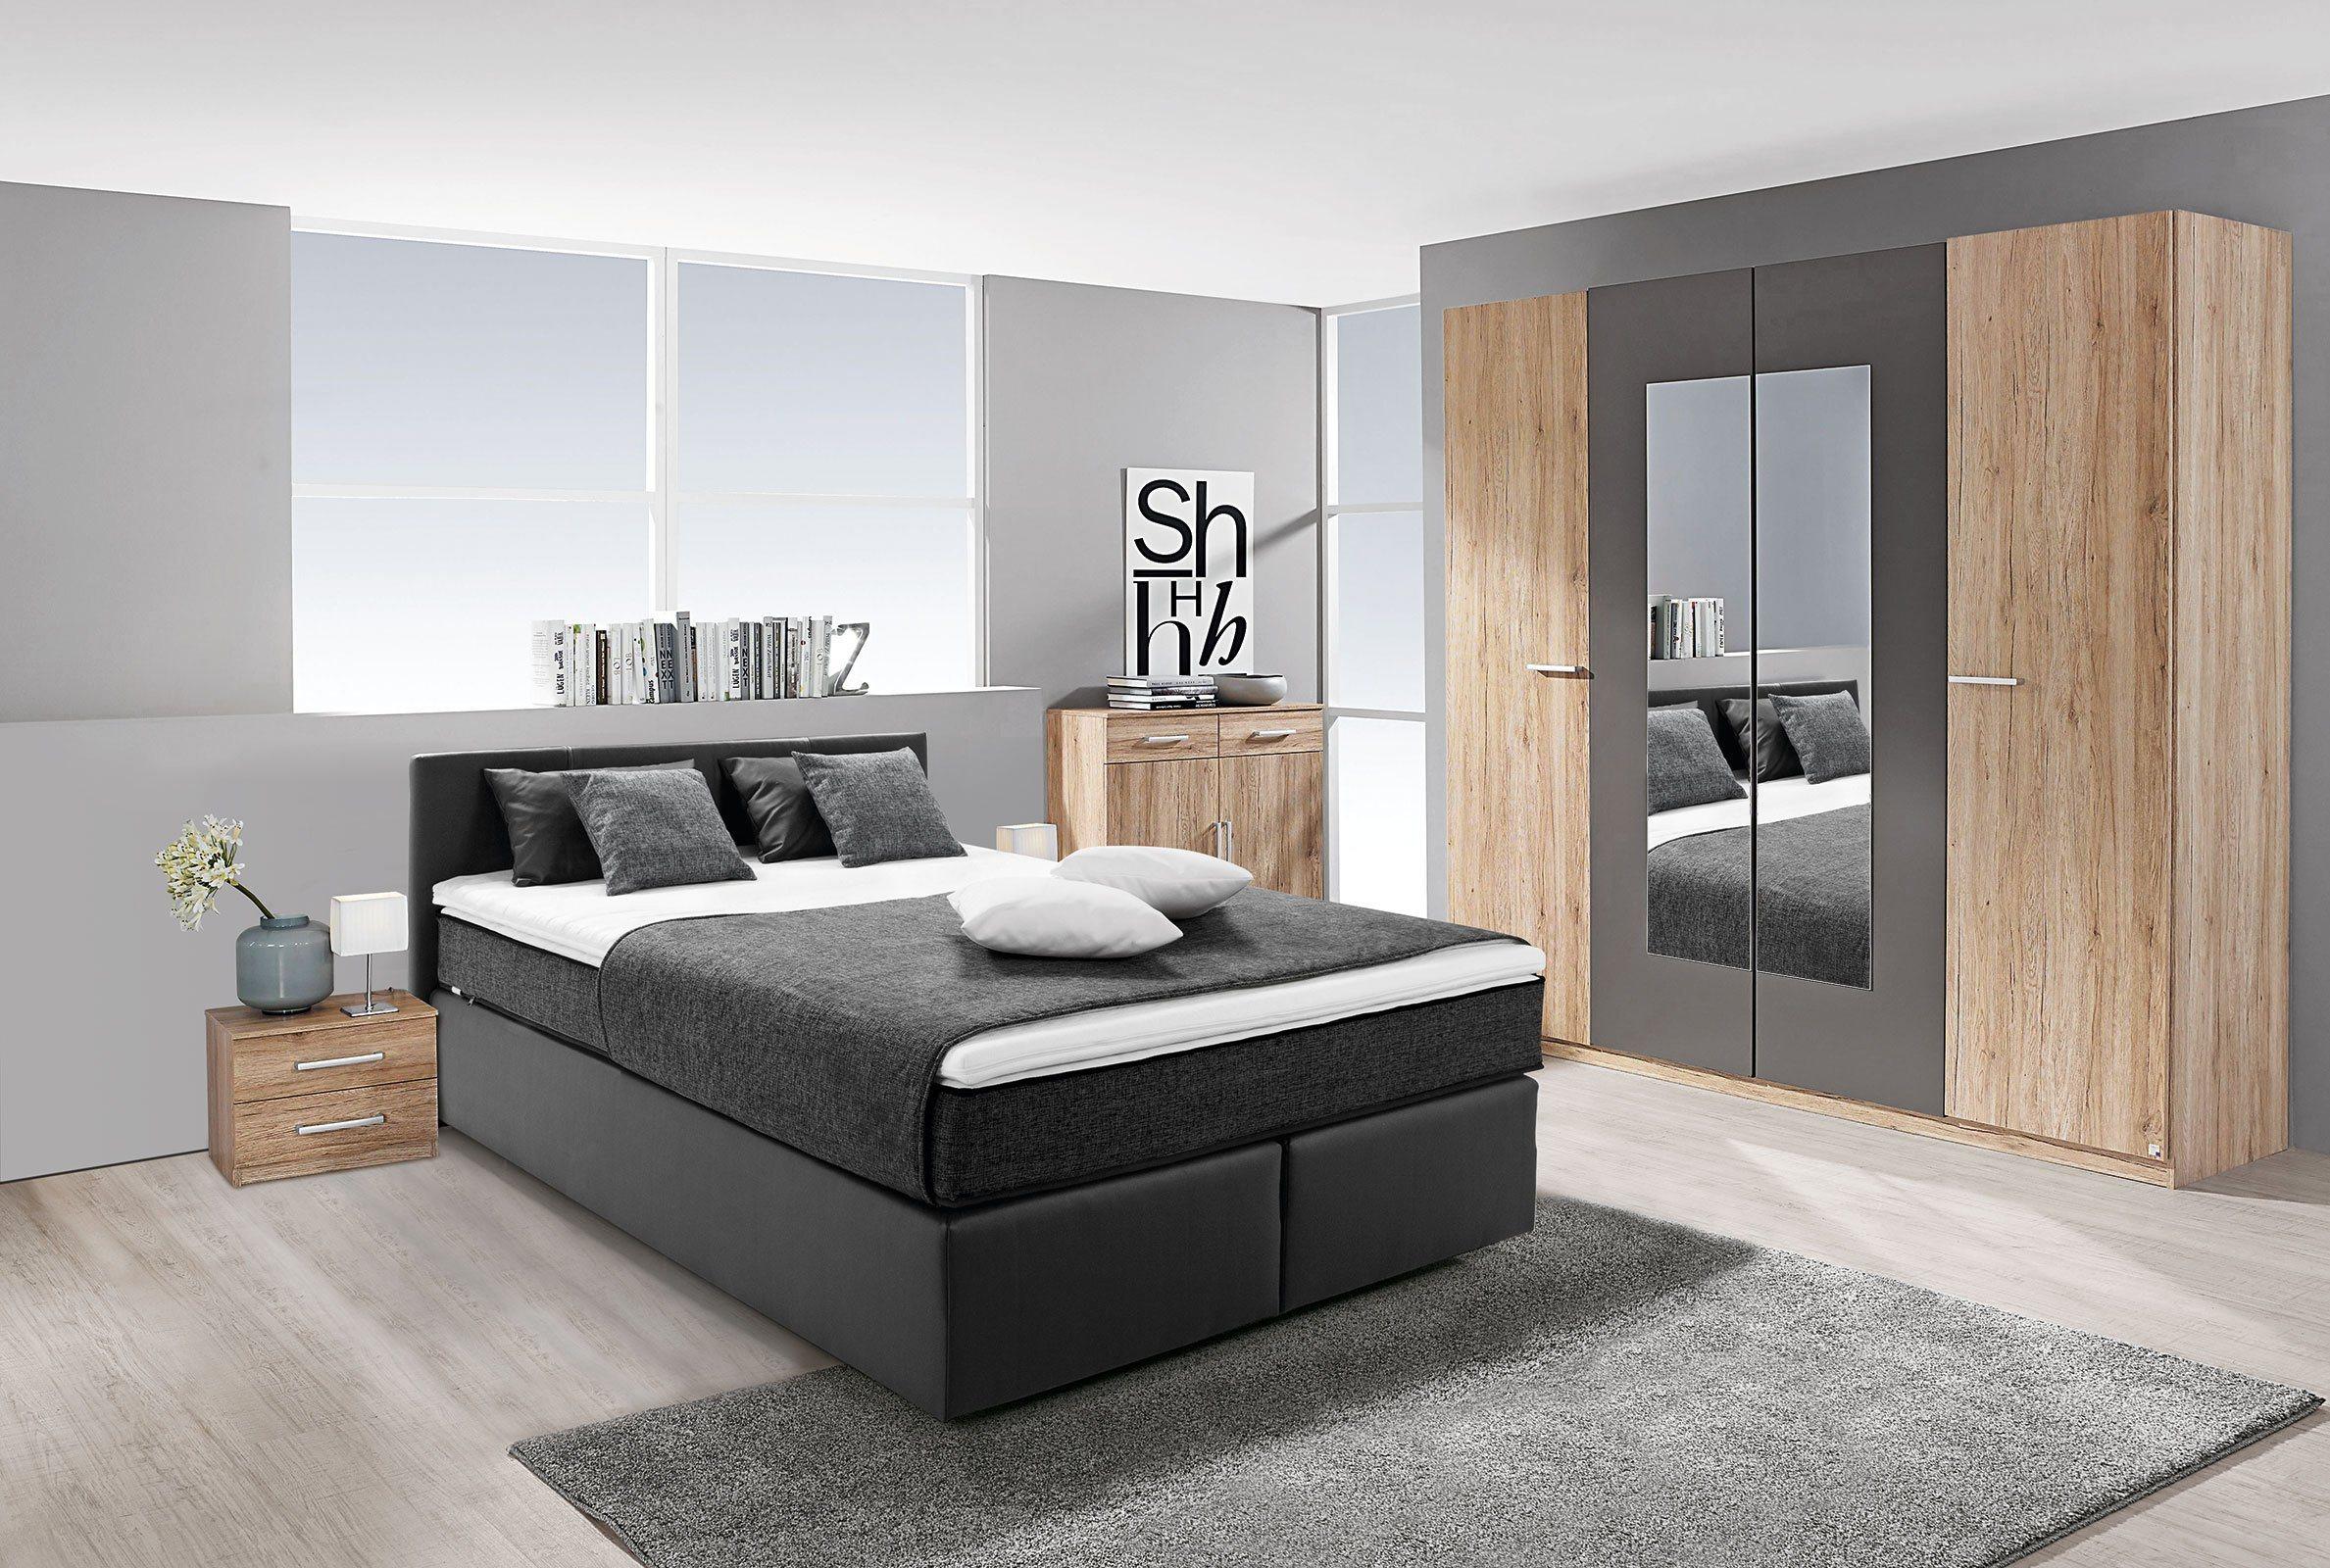 hti living boxspringbett peach online kaufen bei woonio. Black Bedroom Furniture Sets. Home Design Ideas